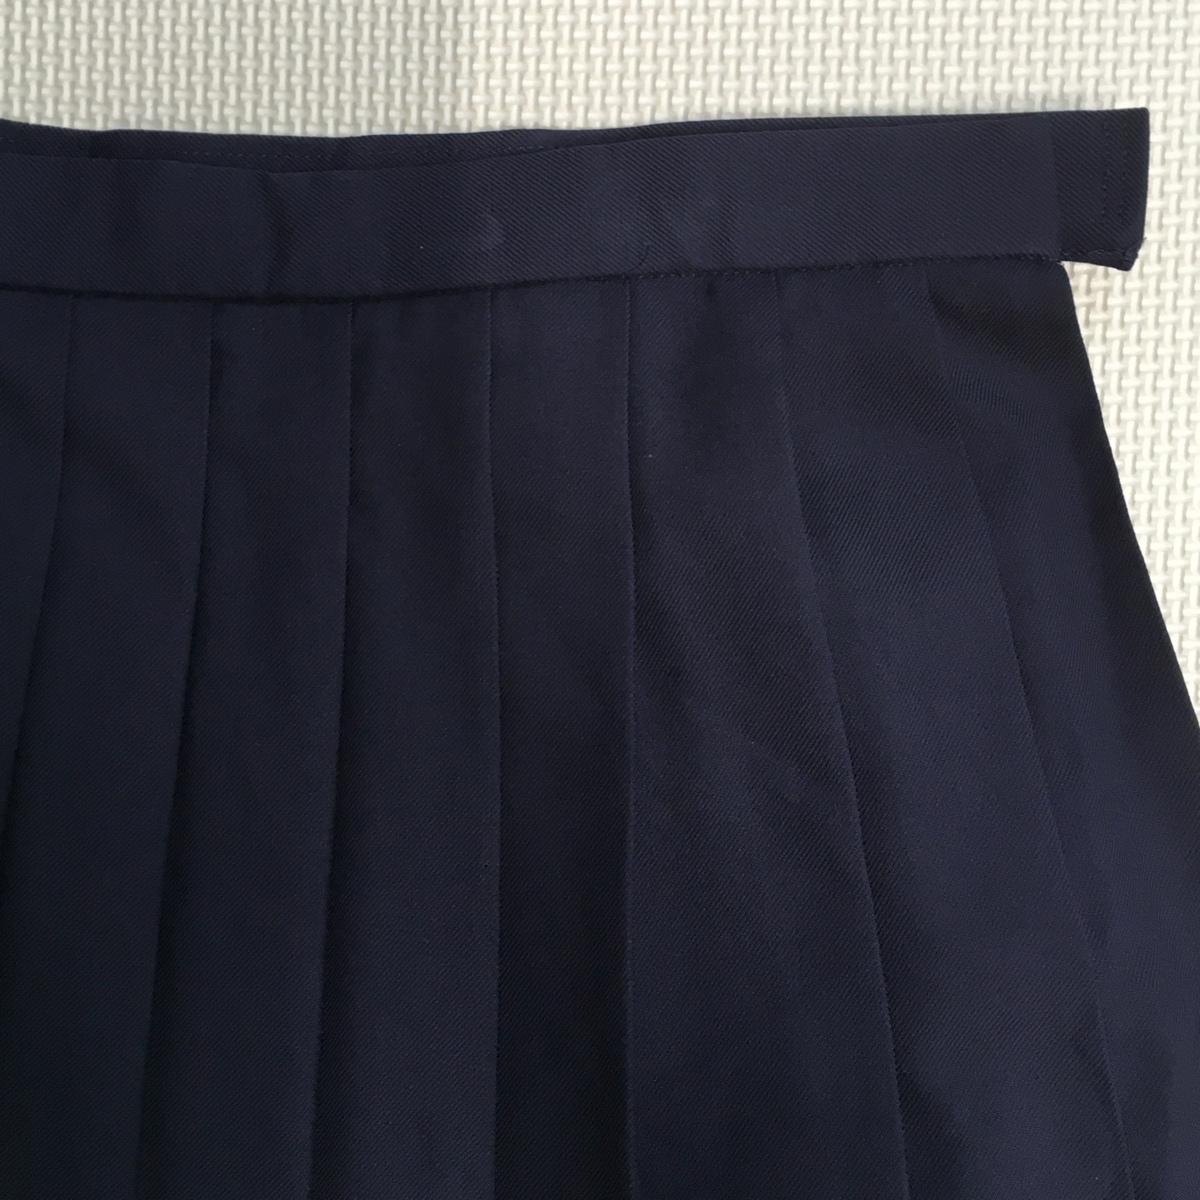 A610 (中古) スカート ブラウス 2点セット /LL/W75/大きいサイズ/スカート/ブラウス/紺/冬服/長袖/制服/中学校/高校/女子学生/学生服/学生_画像5